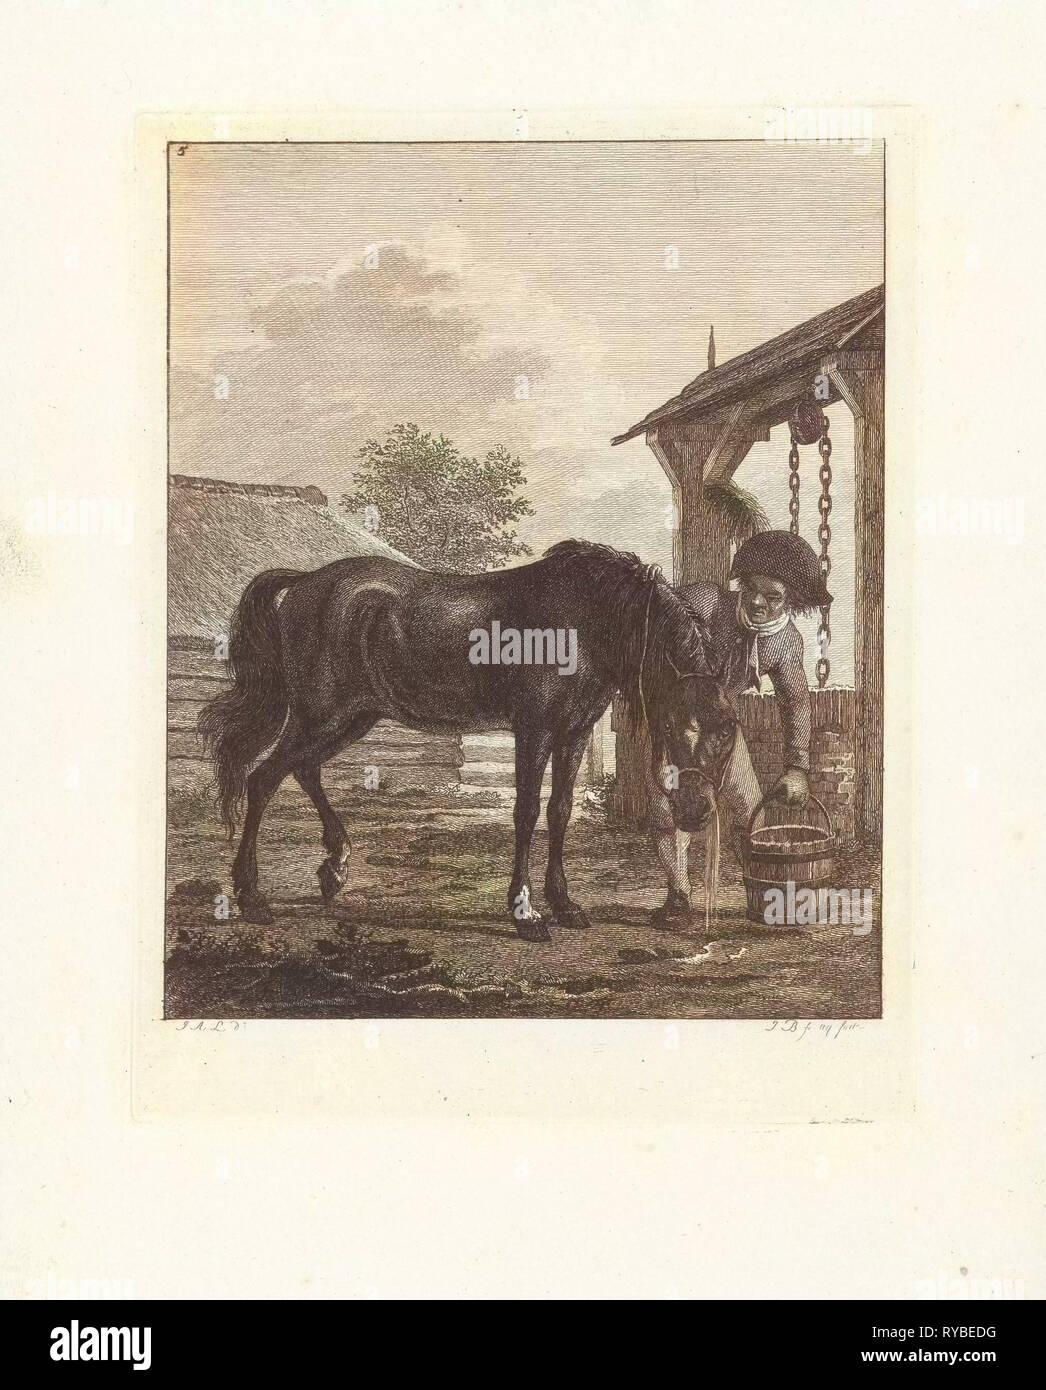 A man and a horse near a well, print maker: Joannes Bemme, Jan Anthonie Langendijk Dzn, 1802 - Stock Image